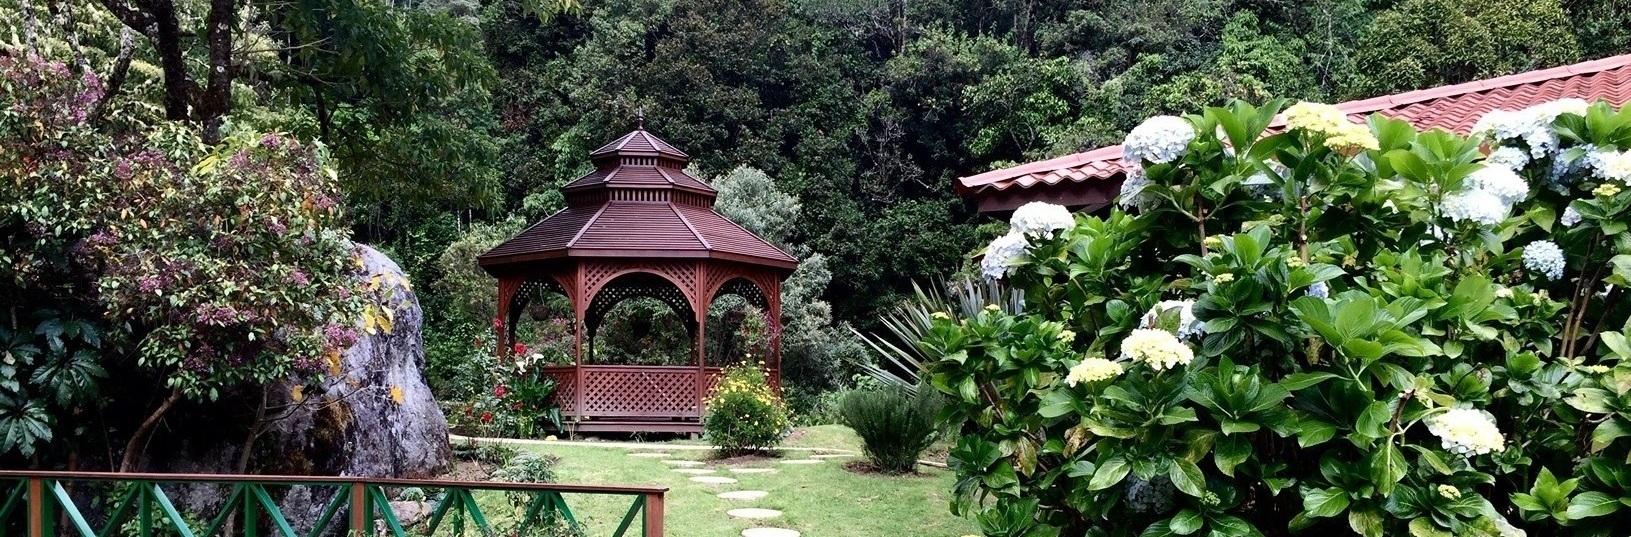 Los Santos Forest Reserve, Costa Rica